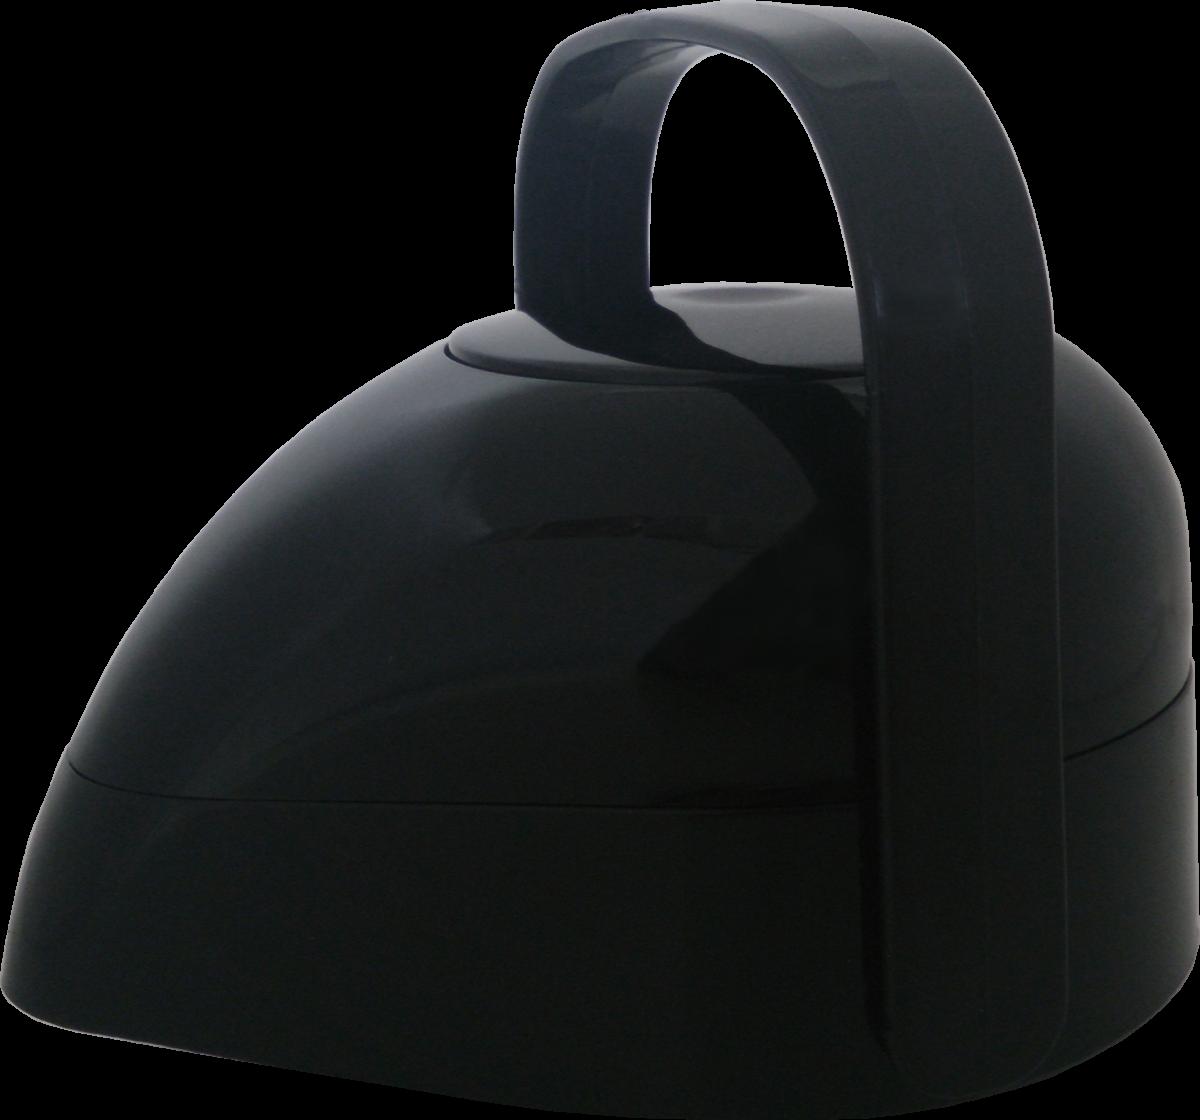 Kit 3 Bombas de Pressão para Garrafa Térmica R-Evolution 1.9L Termolar 2